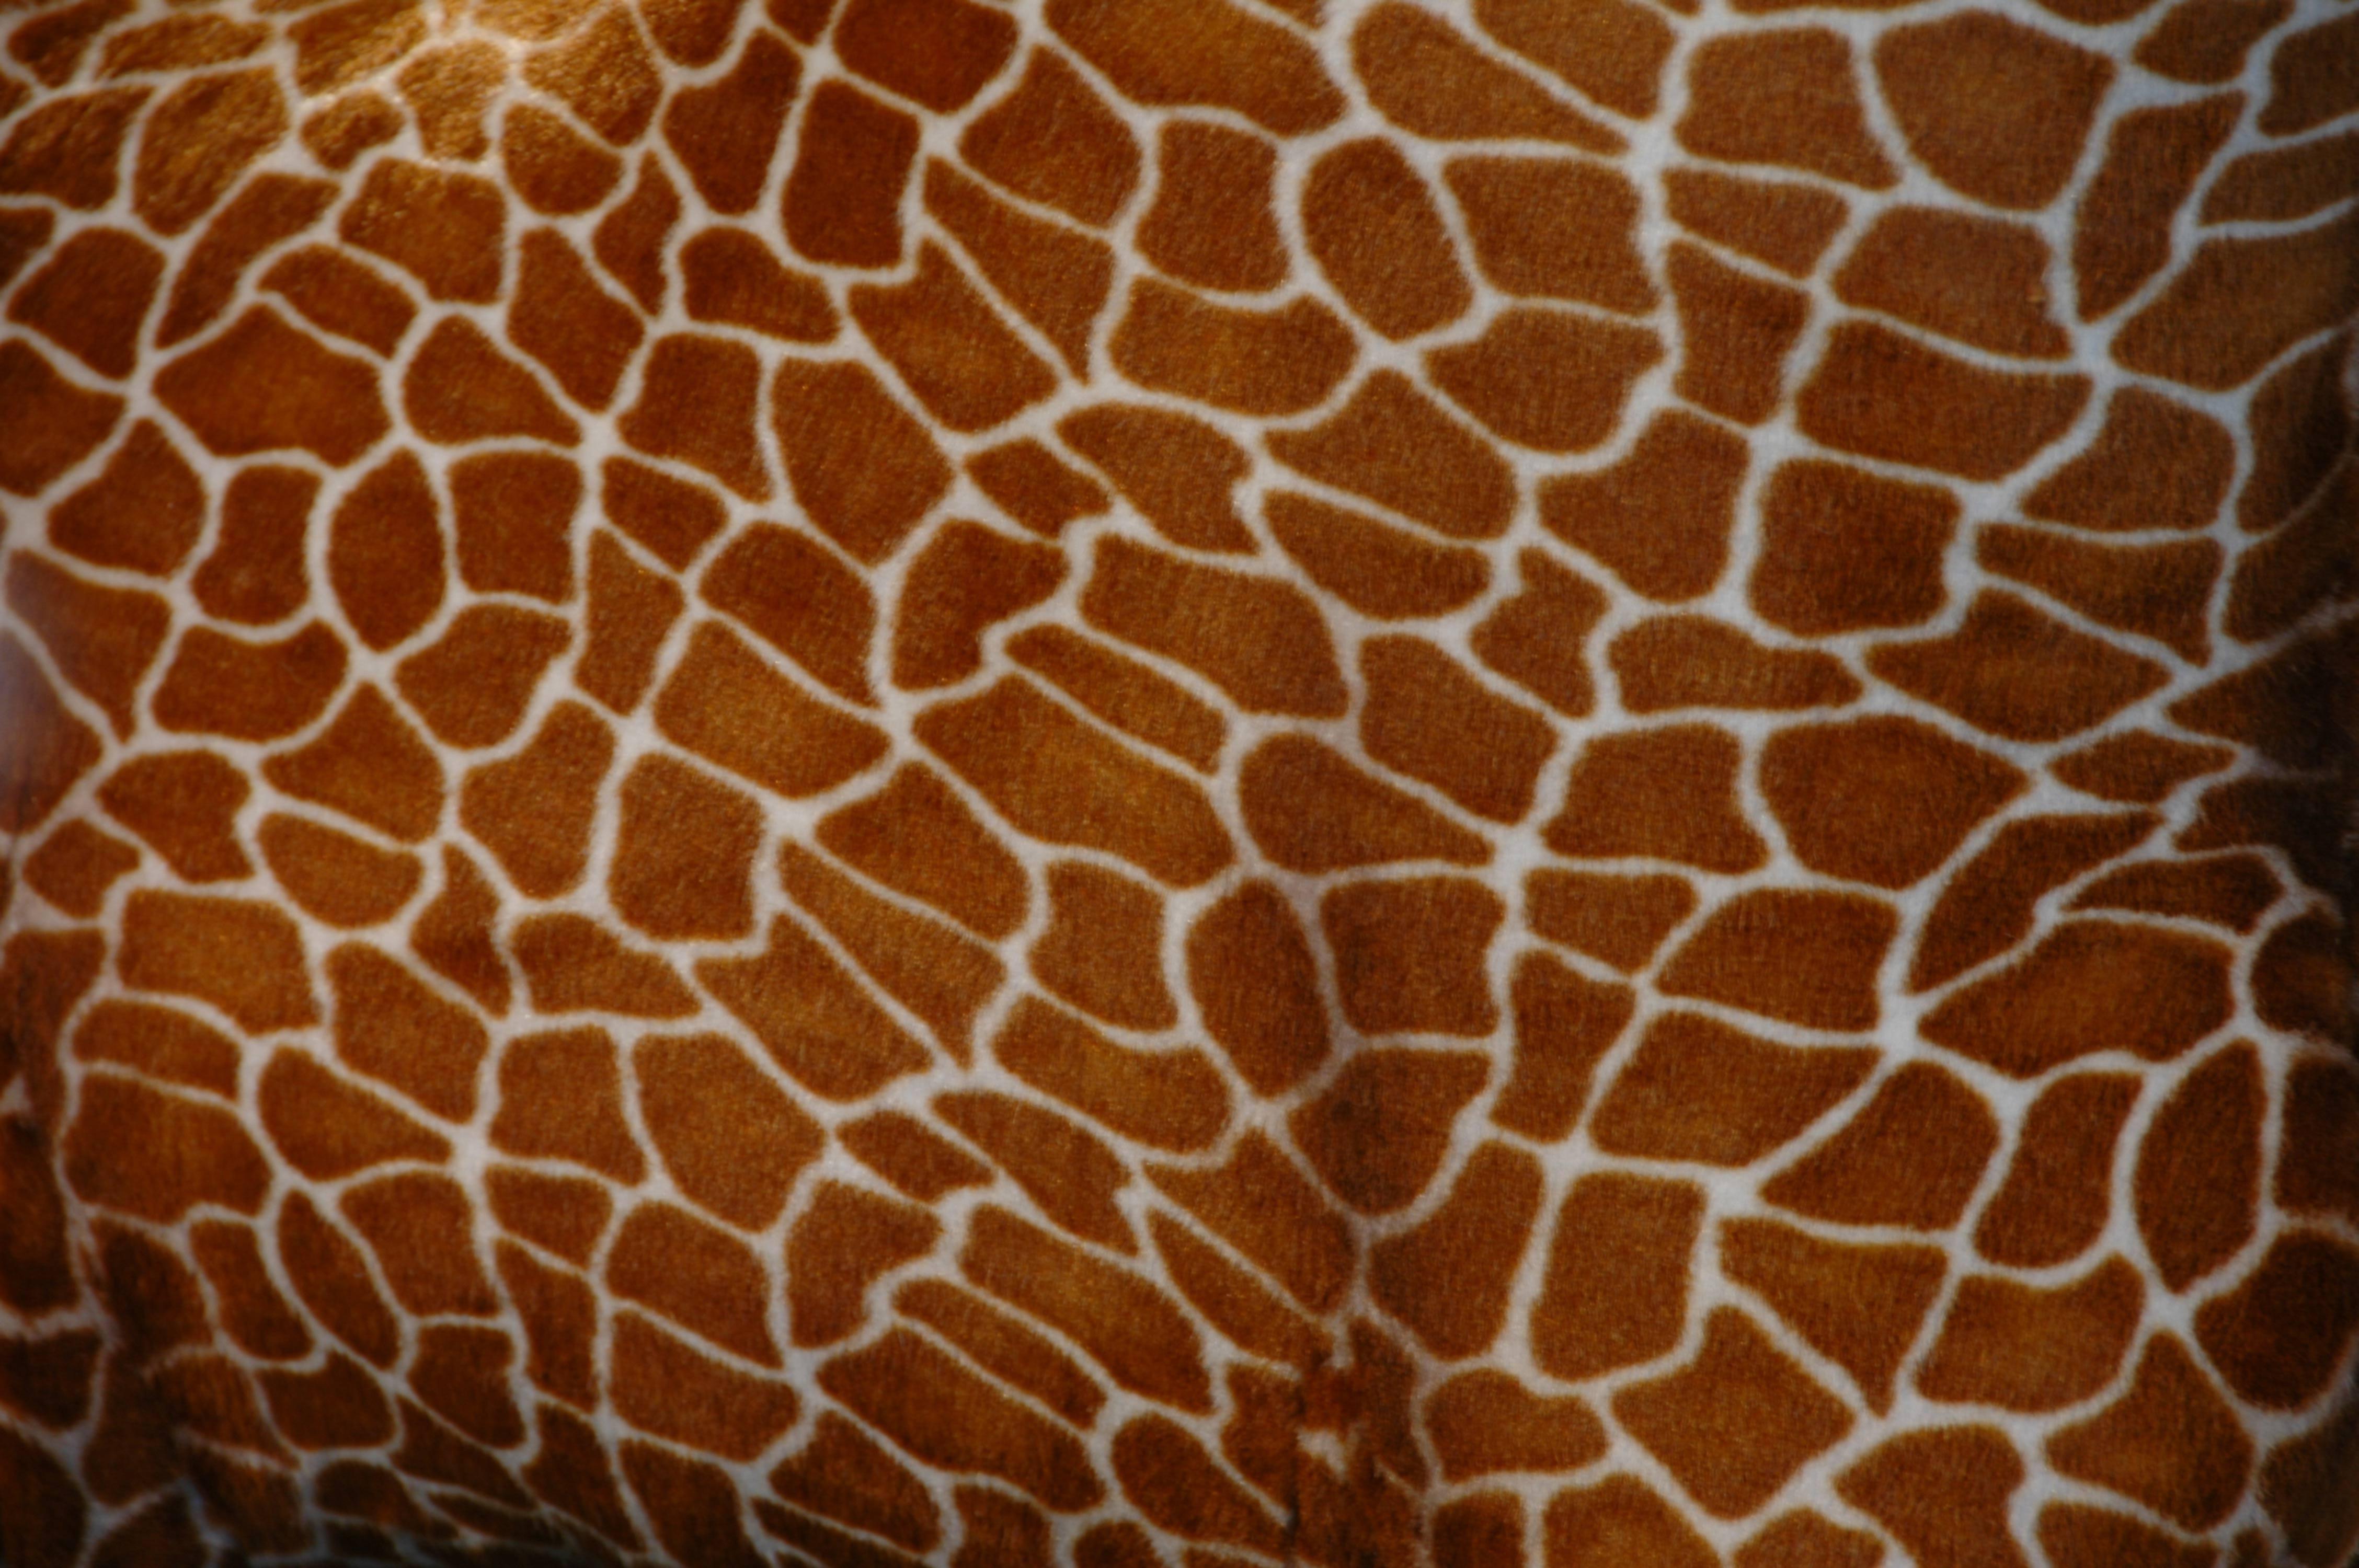 Giraffe Toy Skin Texture